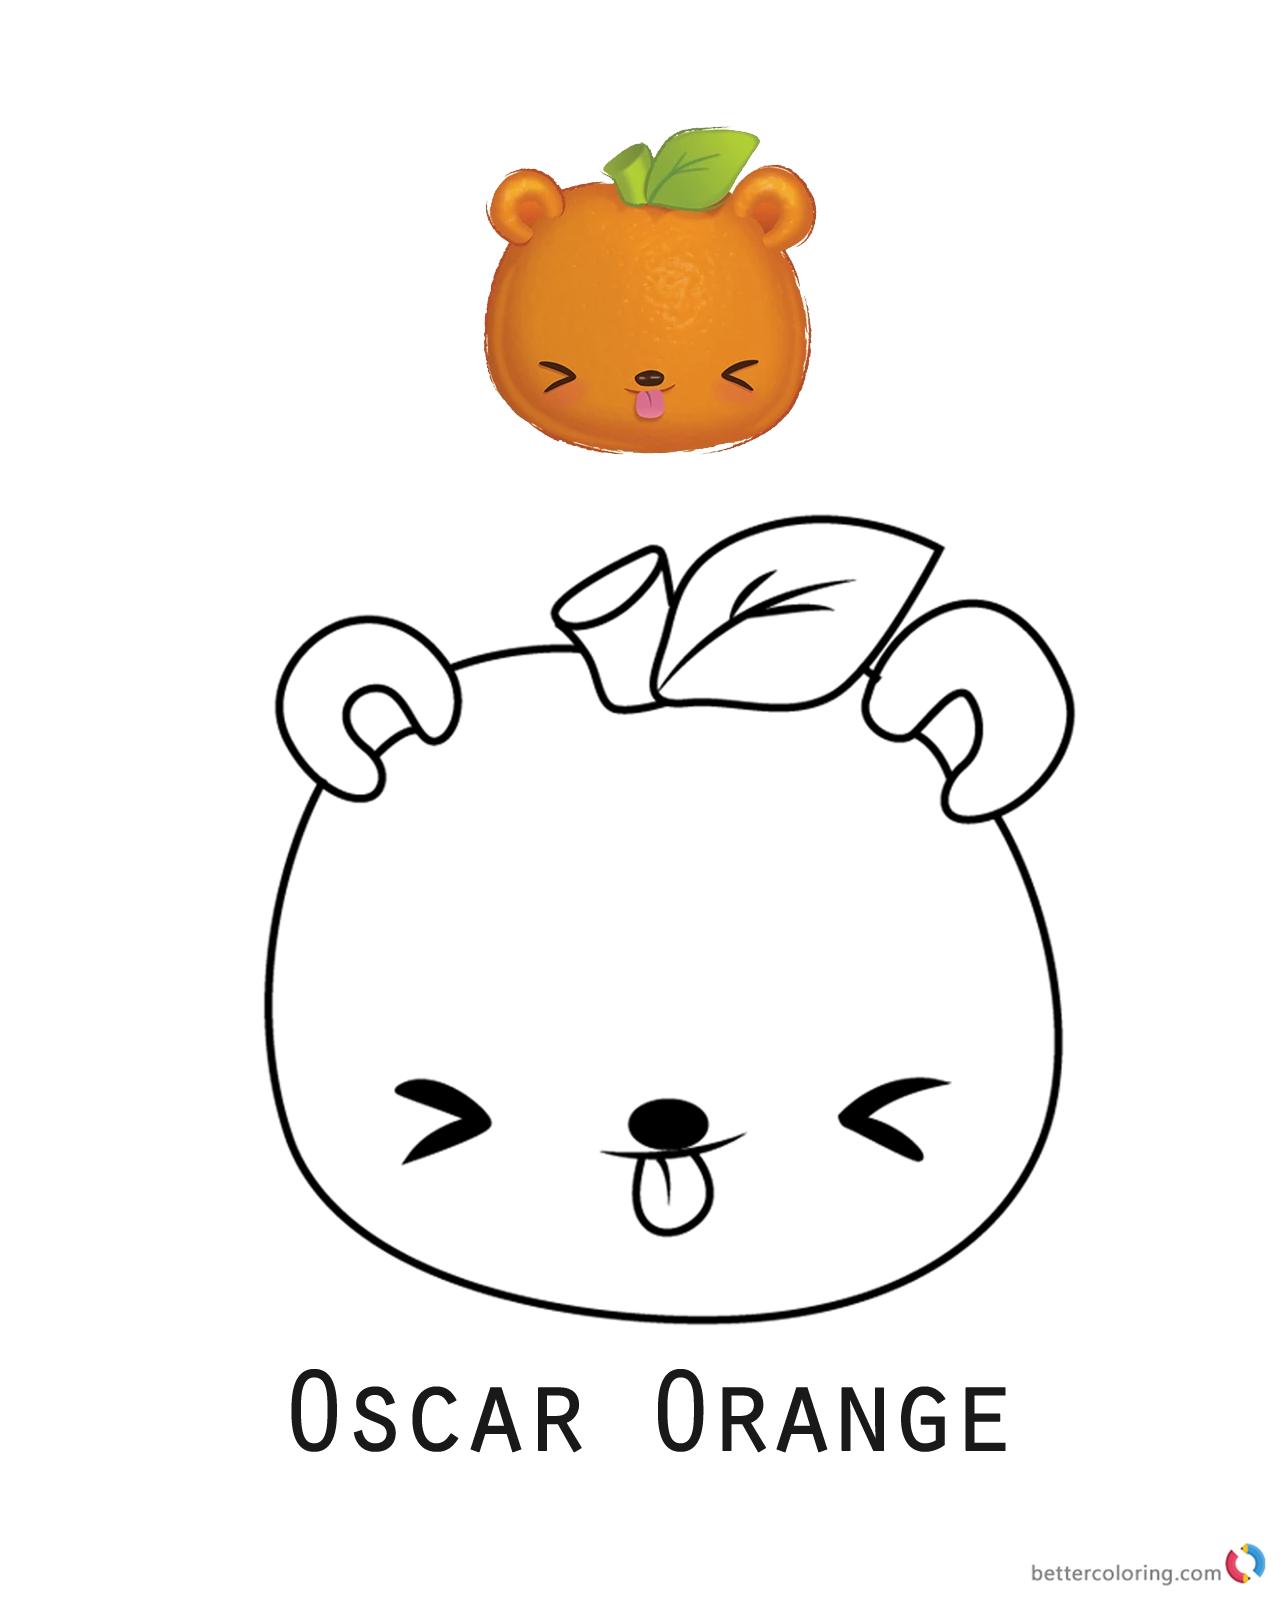 Orange slice coloring pages